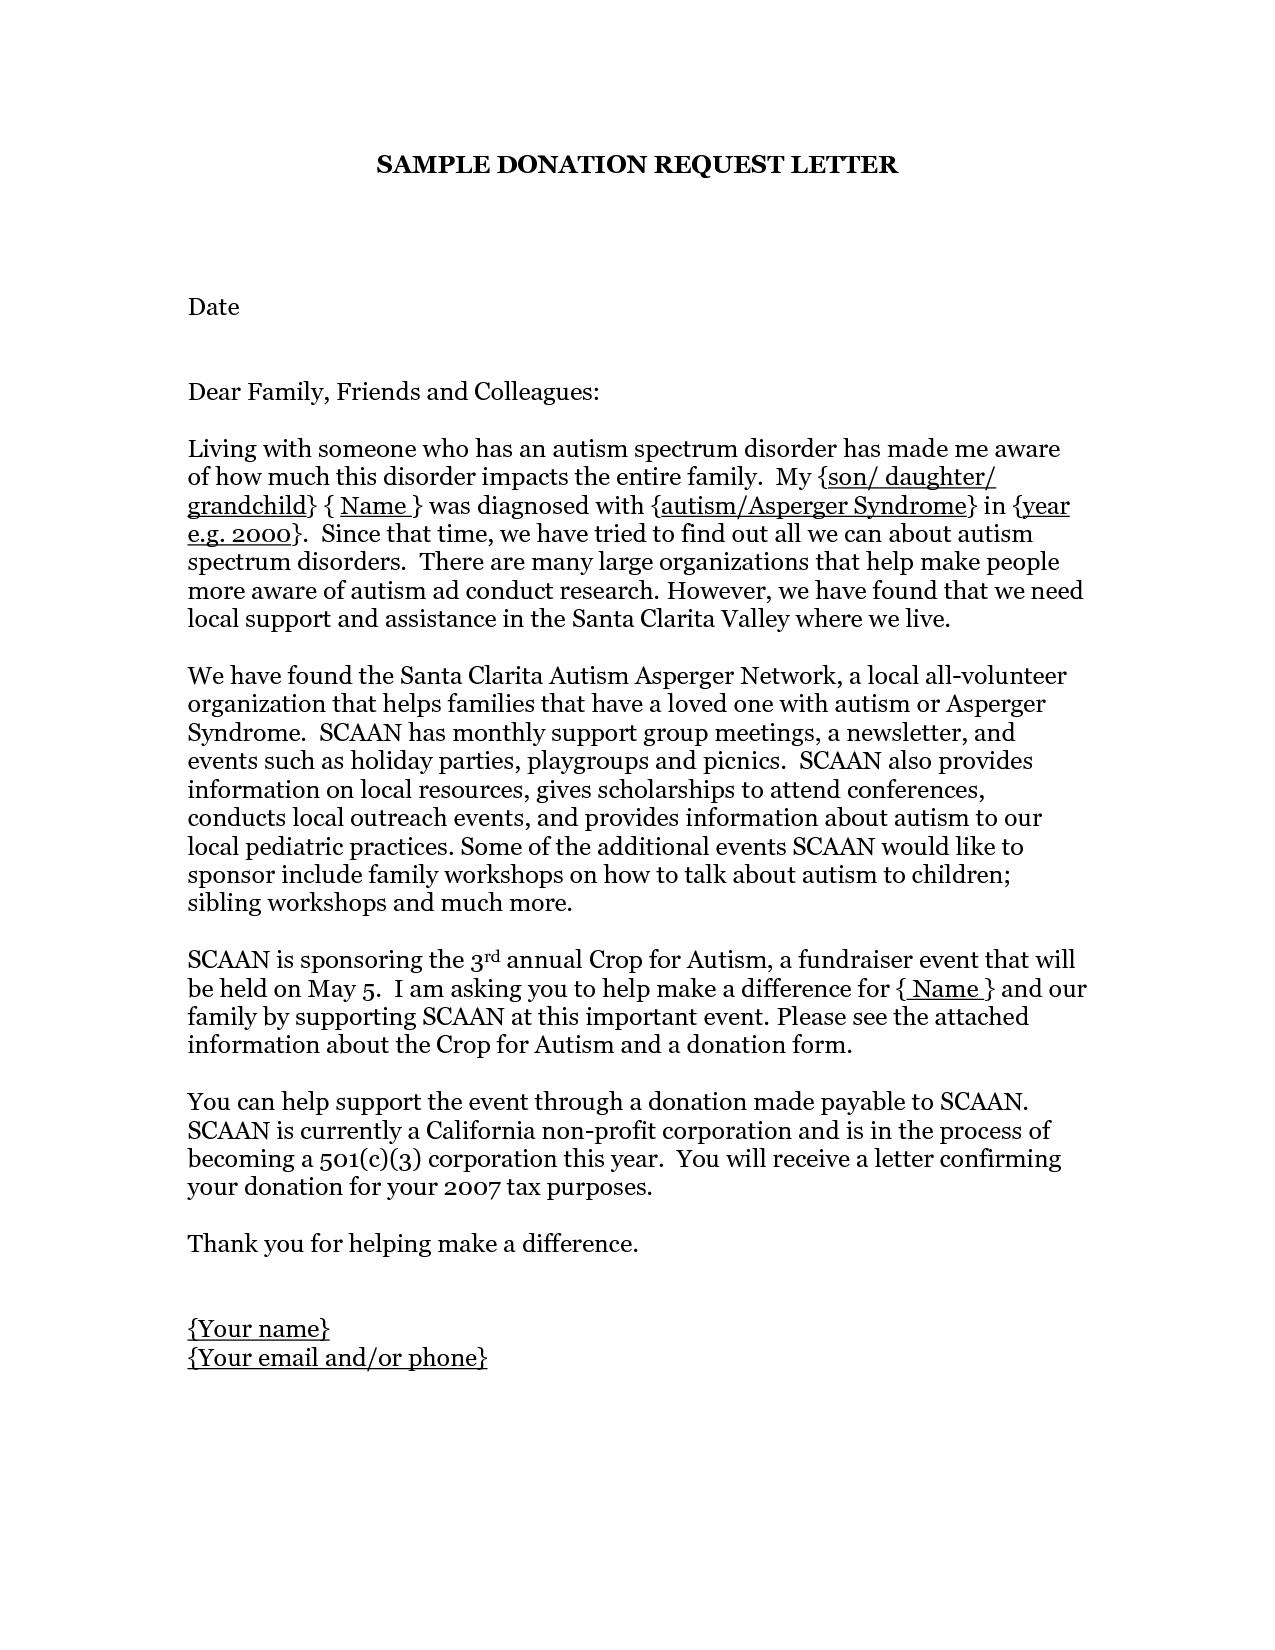 Ergonomic Chair Request Letter Portable Wheel Ramp Donation Sample Letters